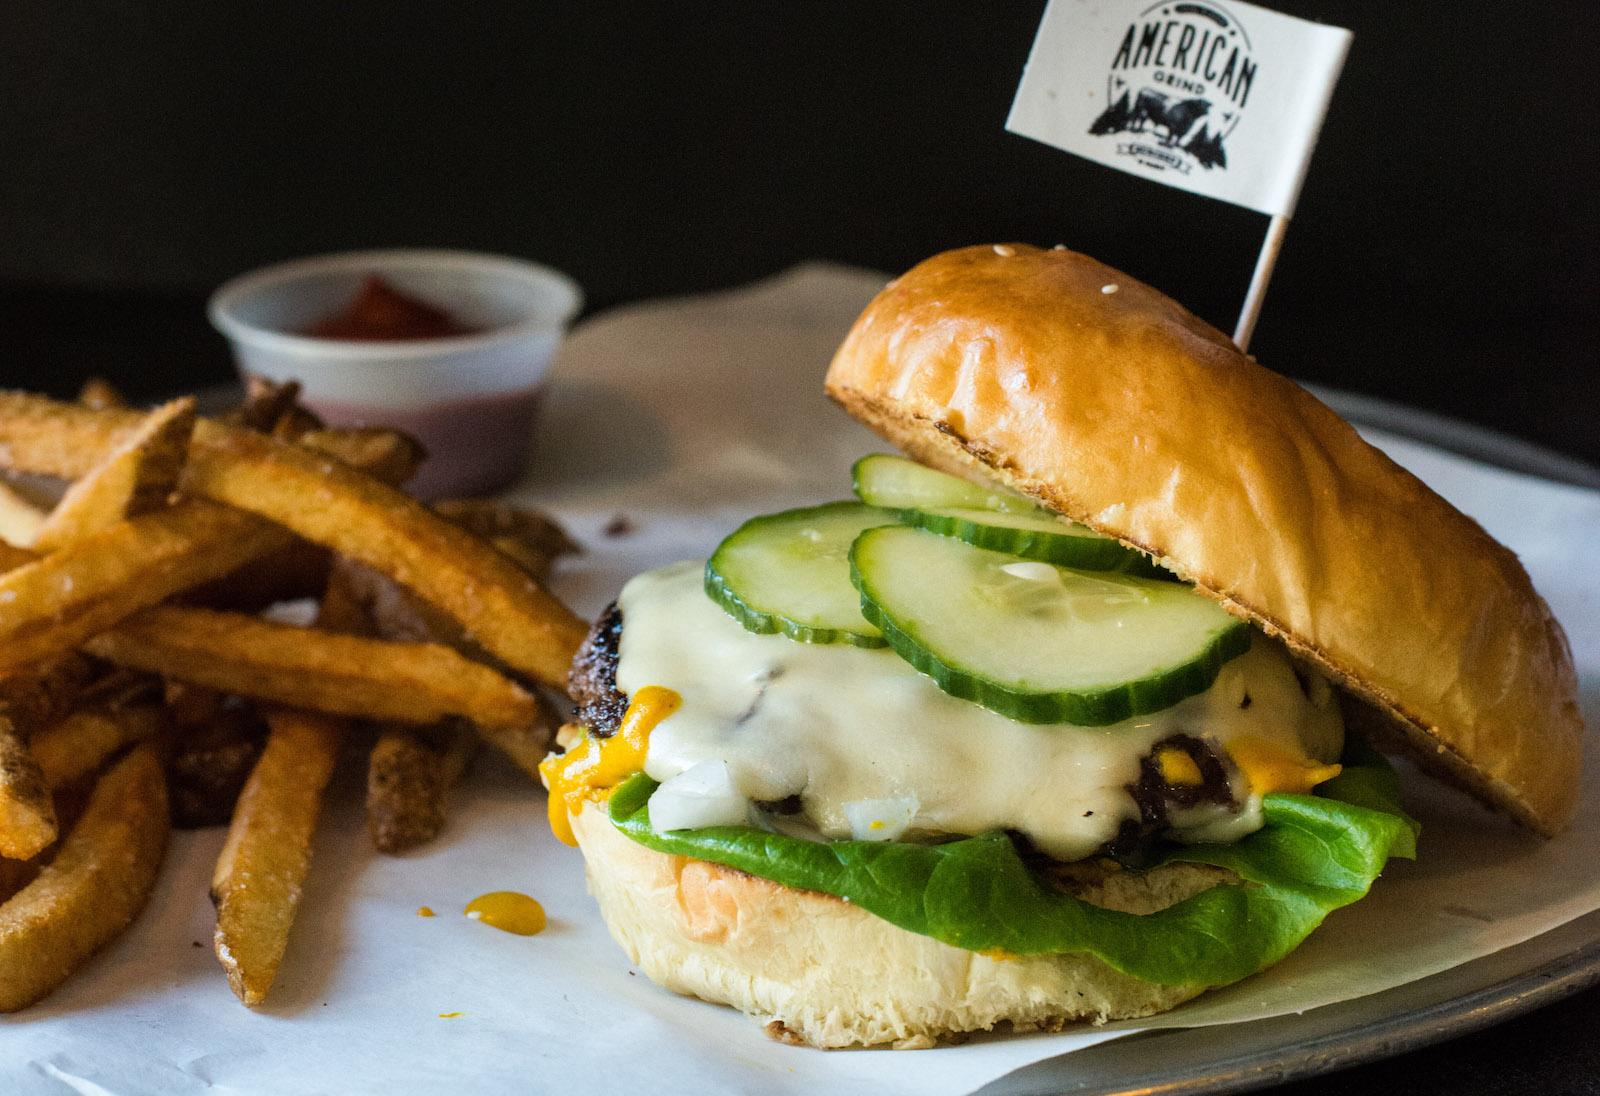 American Grind burger